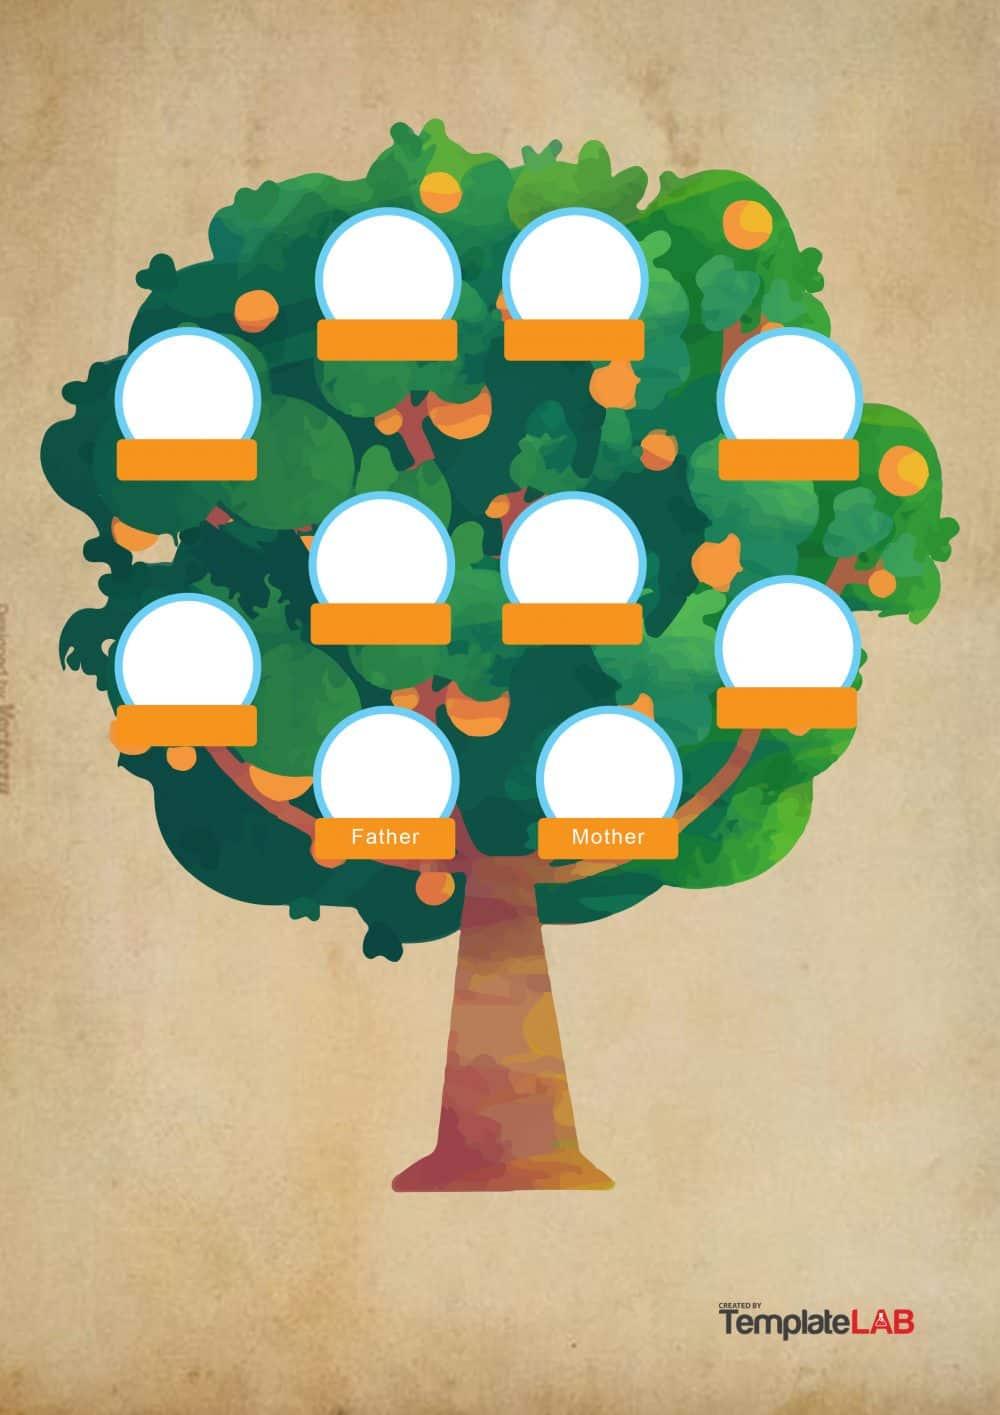 50+ Free Family Tree Templates (Word, Excel, PDF) ᐅ.